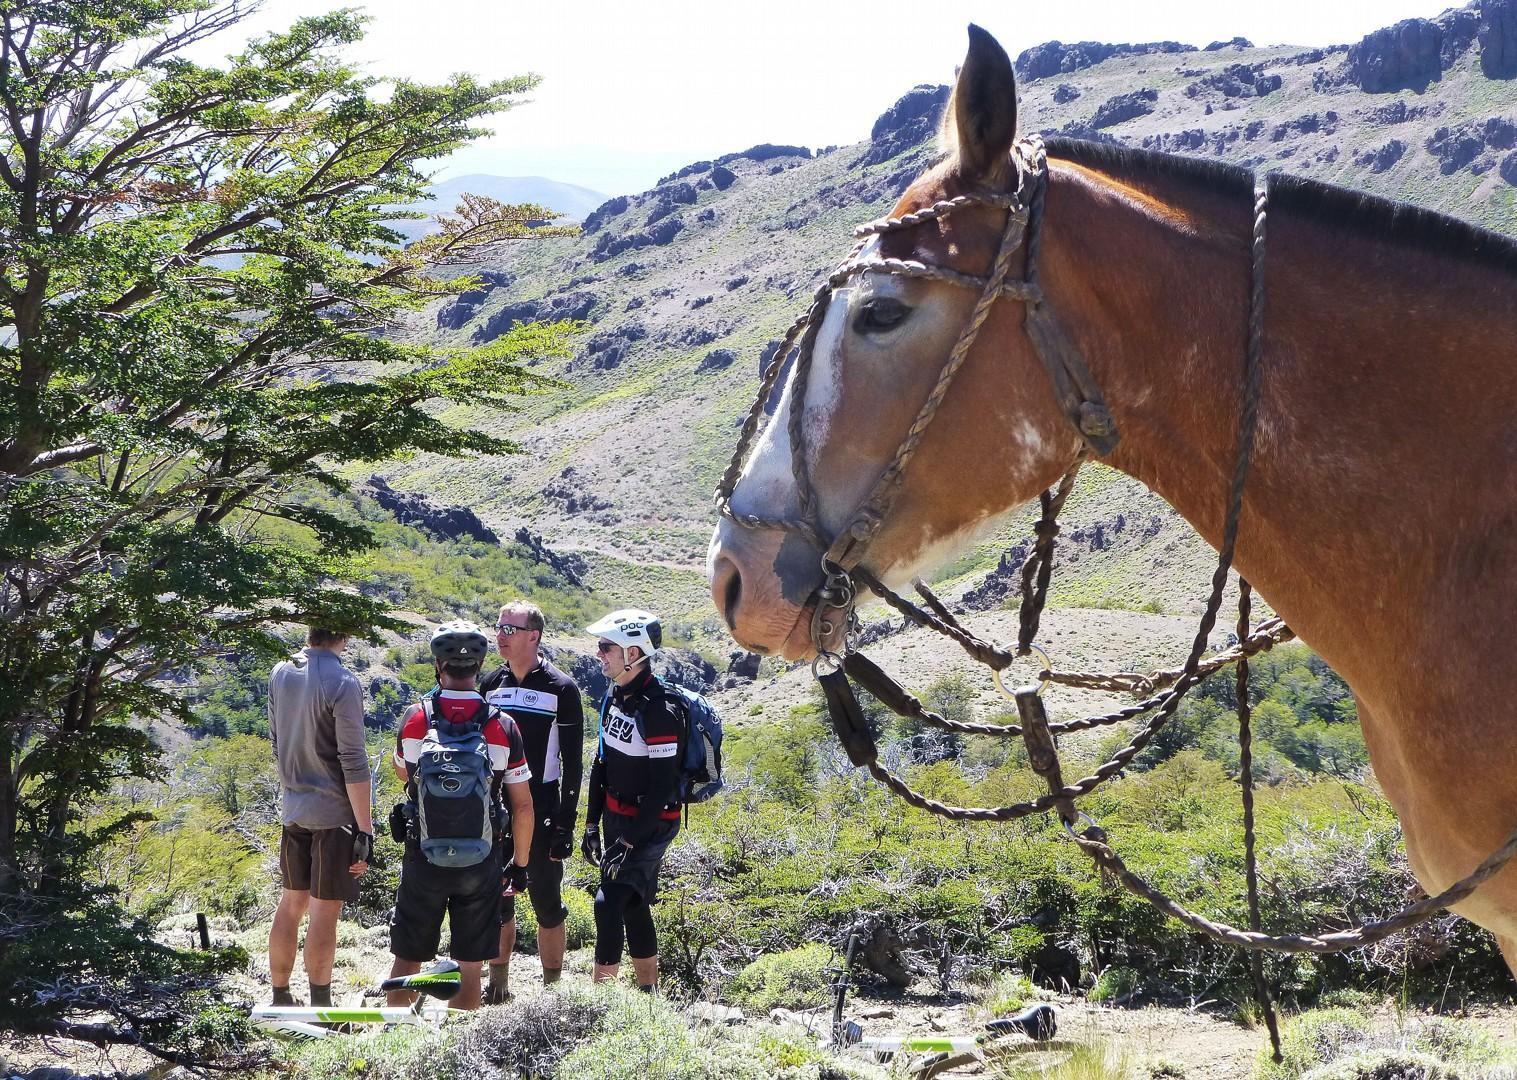 P1030068.JPG - Chile and Argentina - Wild Patagonia - Mountain Biking